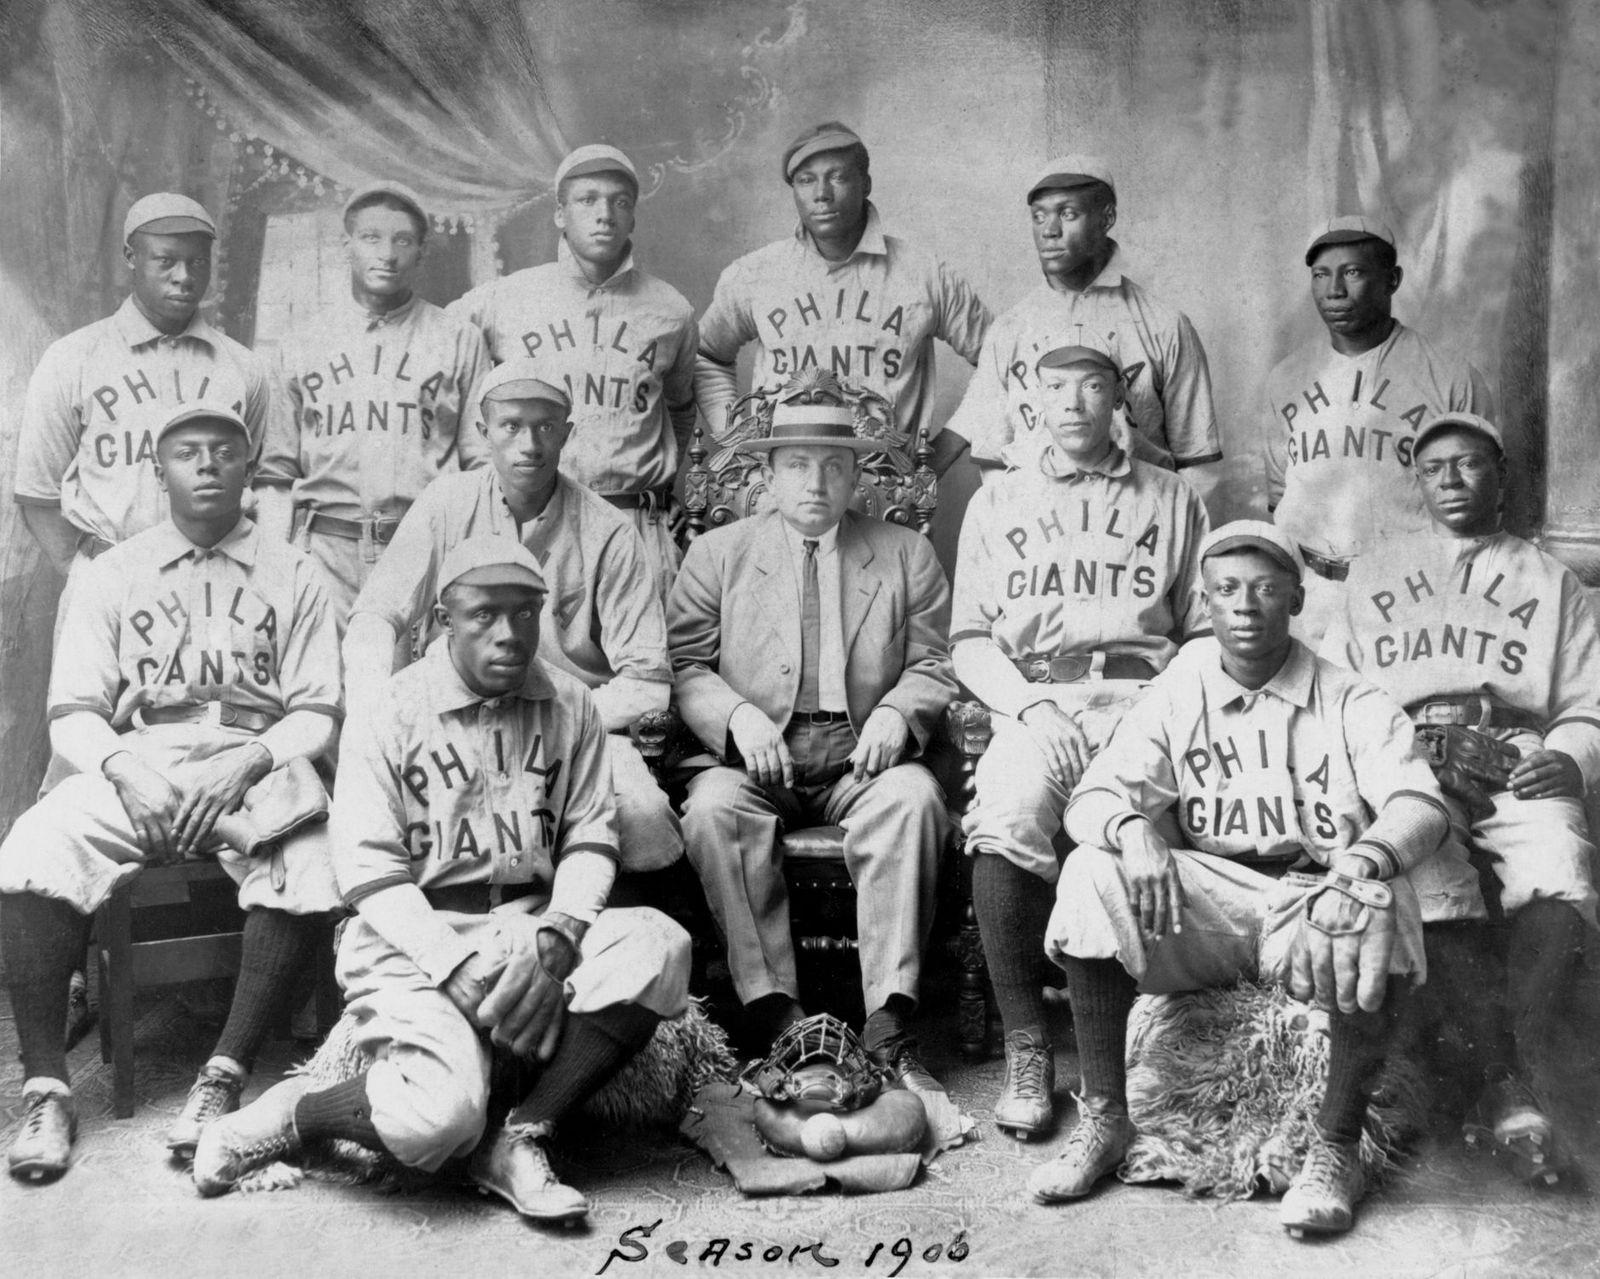 Negro Leagues Phila Giants 1906 5413.96 PD